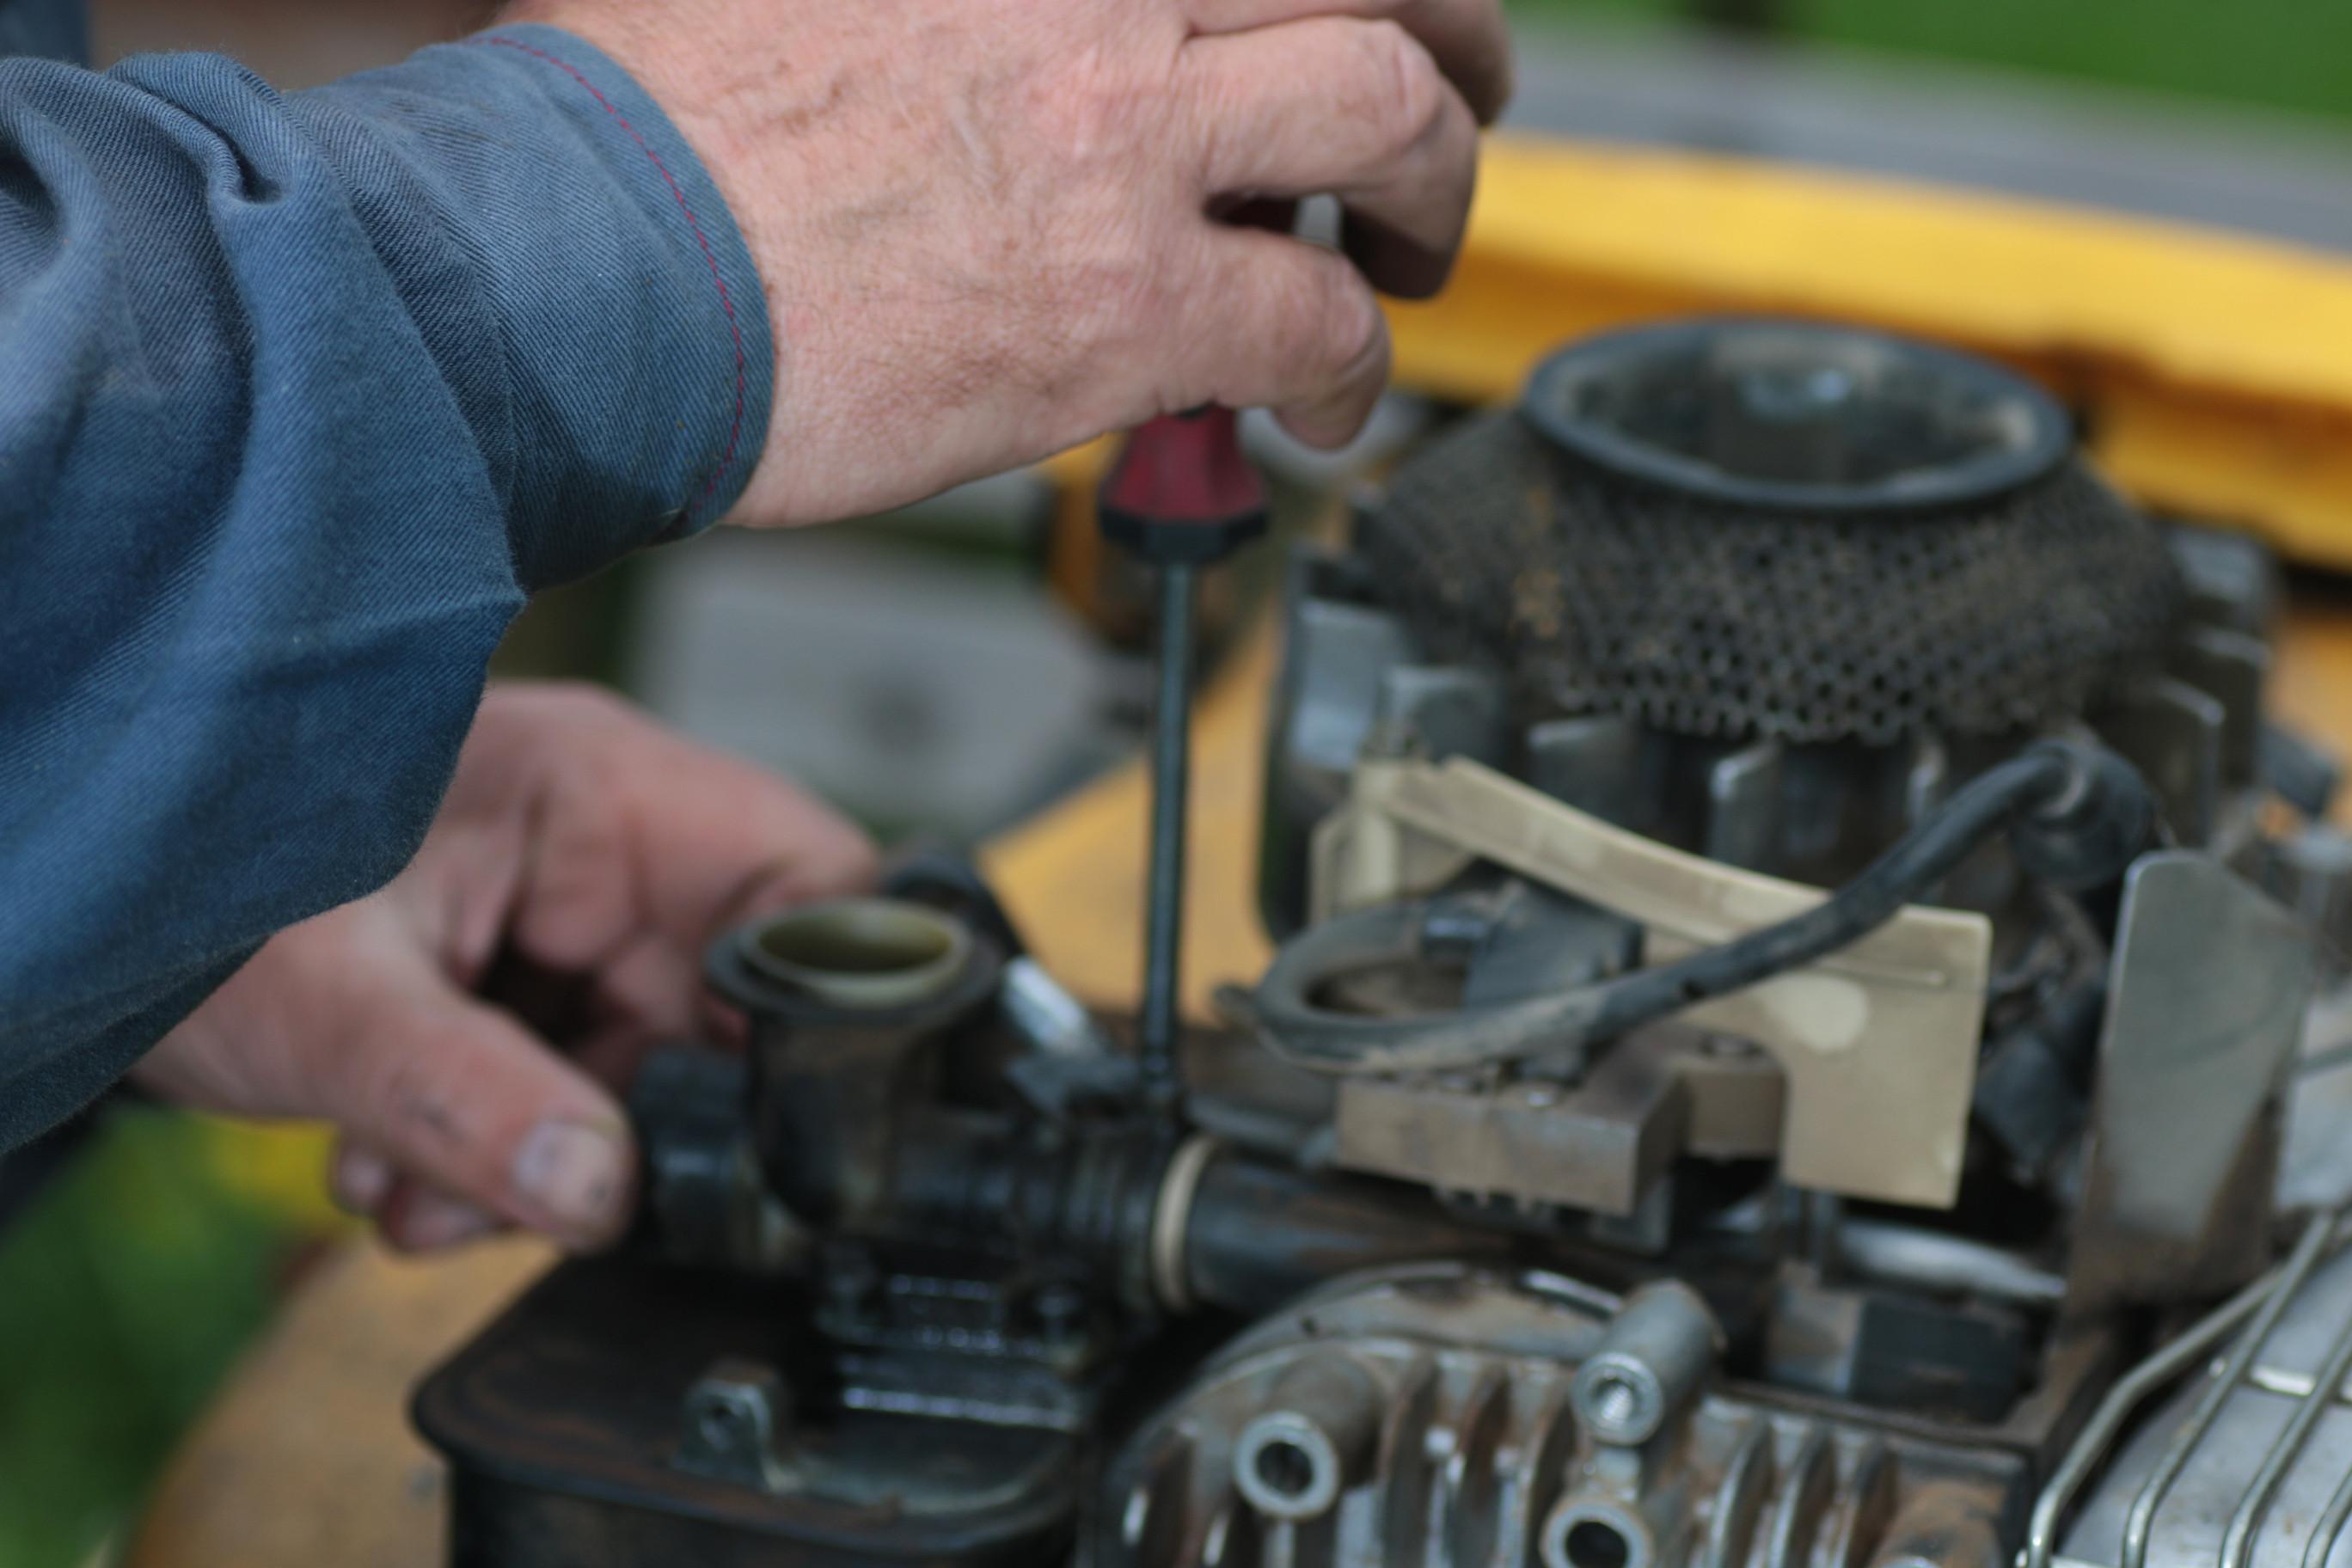 Petrol Lawn Mower Service